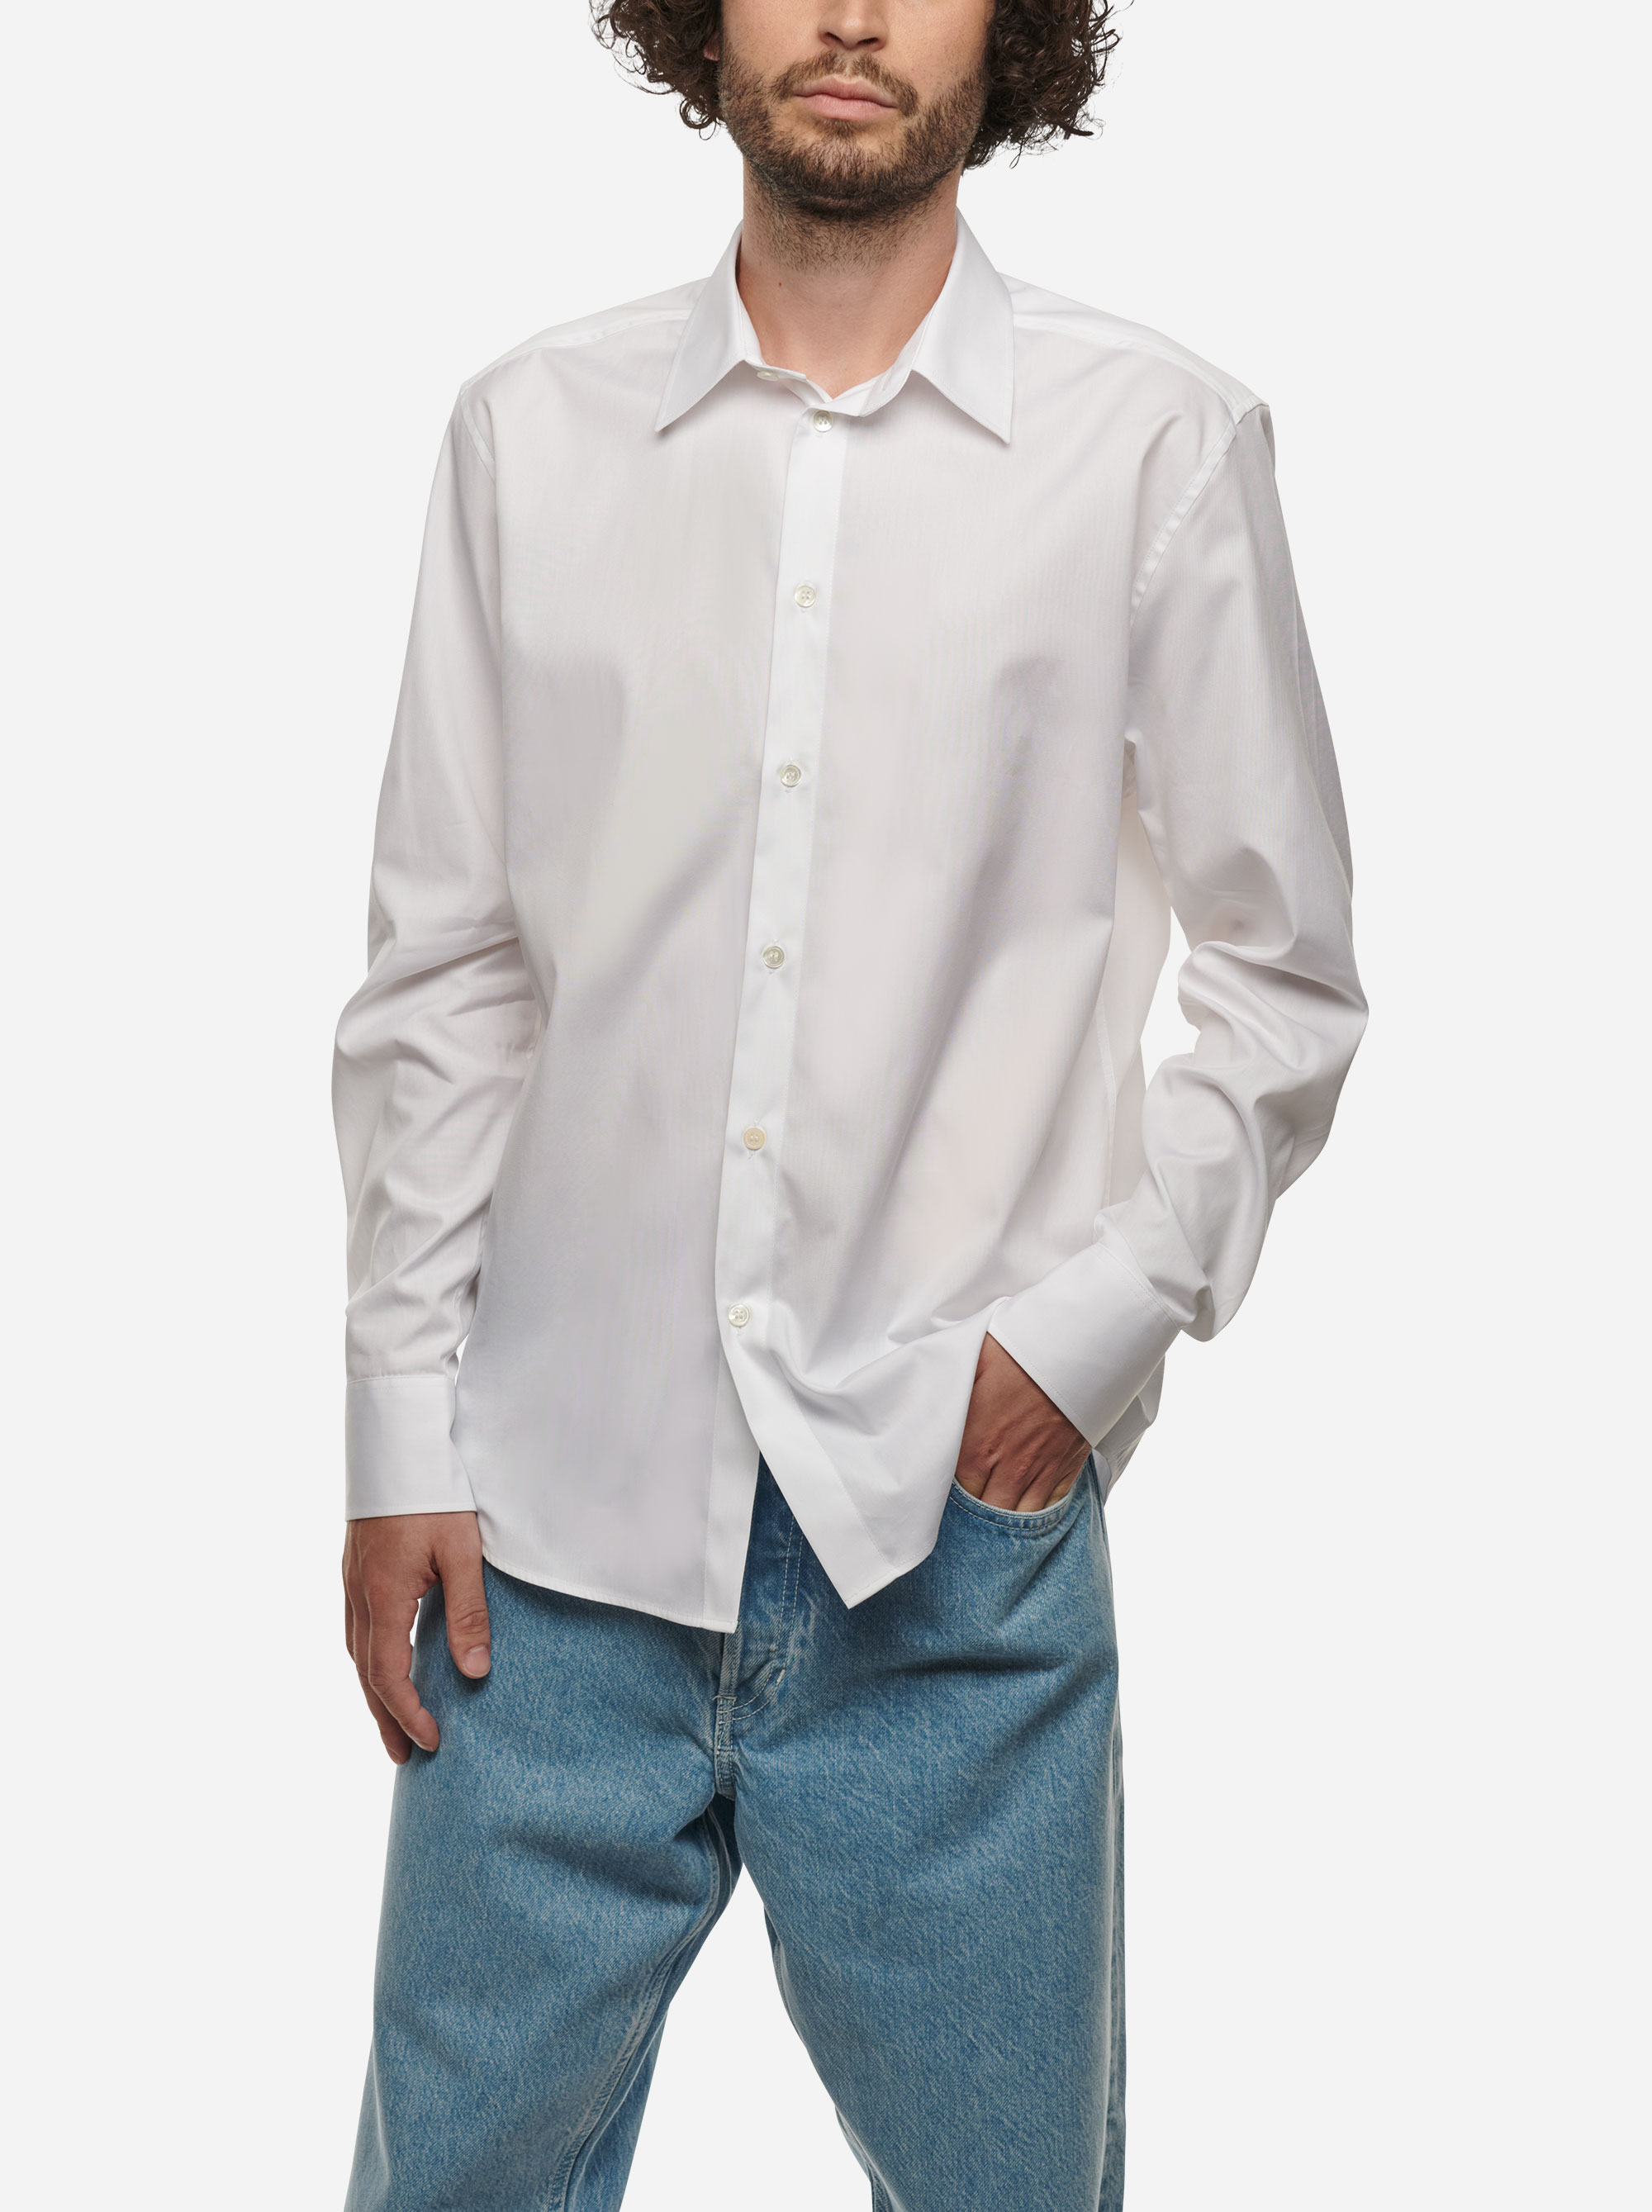 Shirt_Men's_On_Women_Sizeguide_2